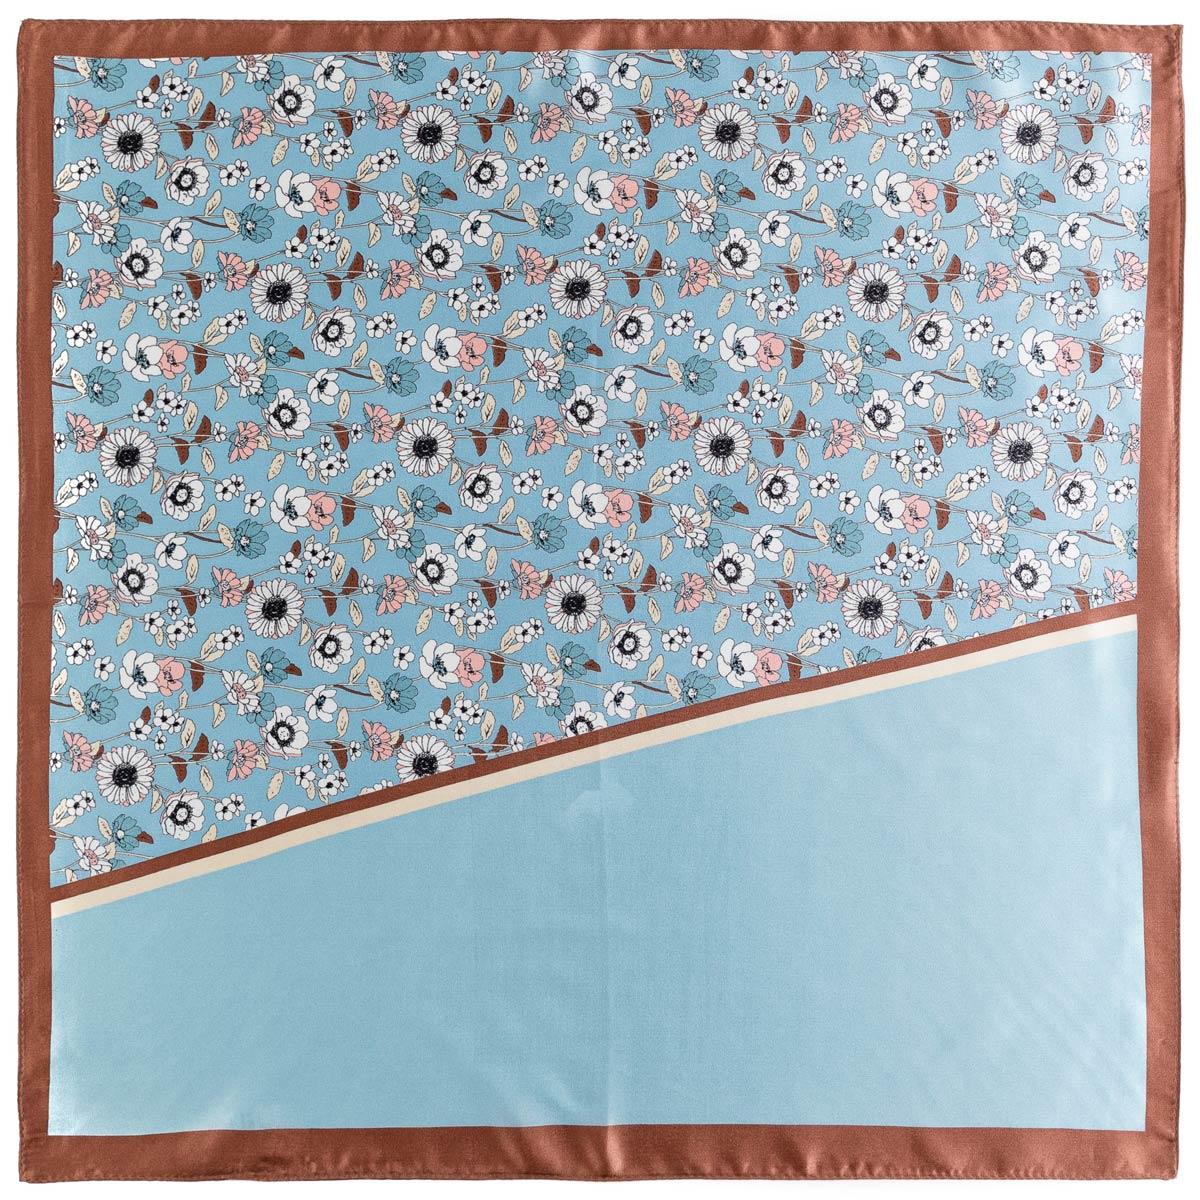 AT-06259-A12-foulard-soie-petites-fleurs